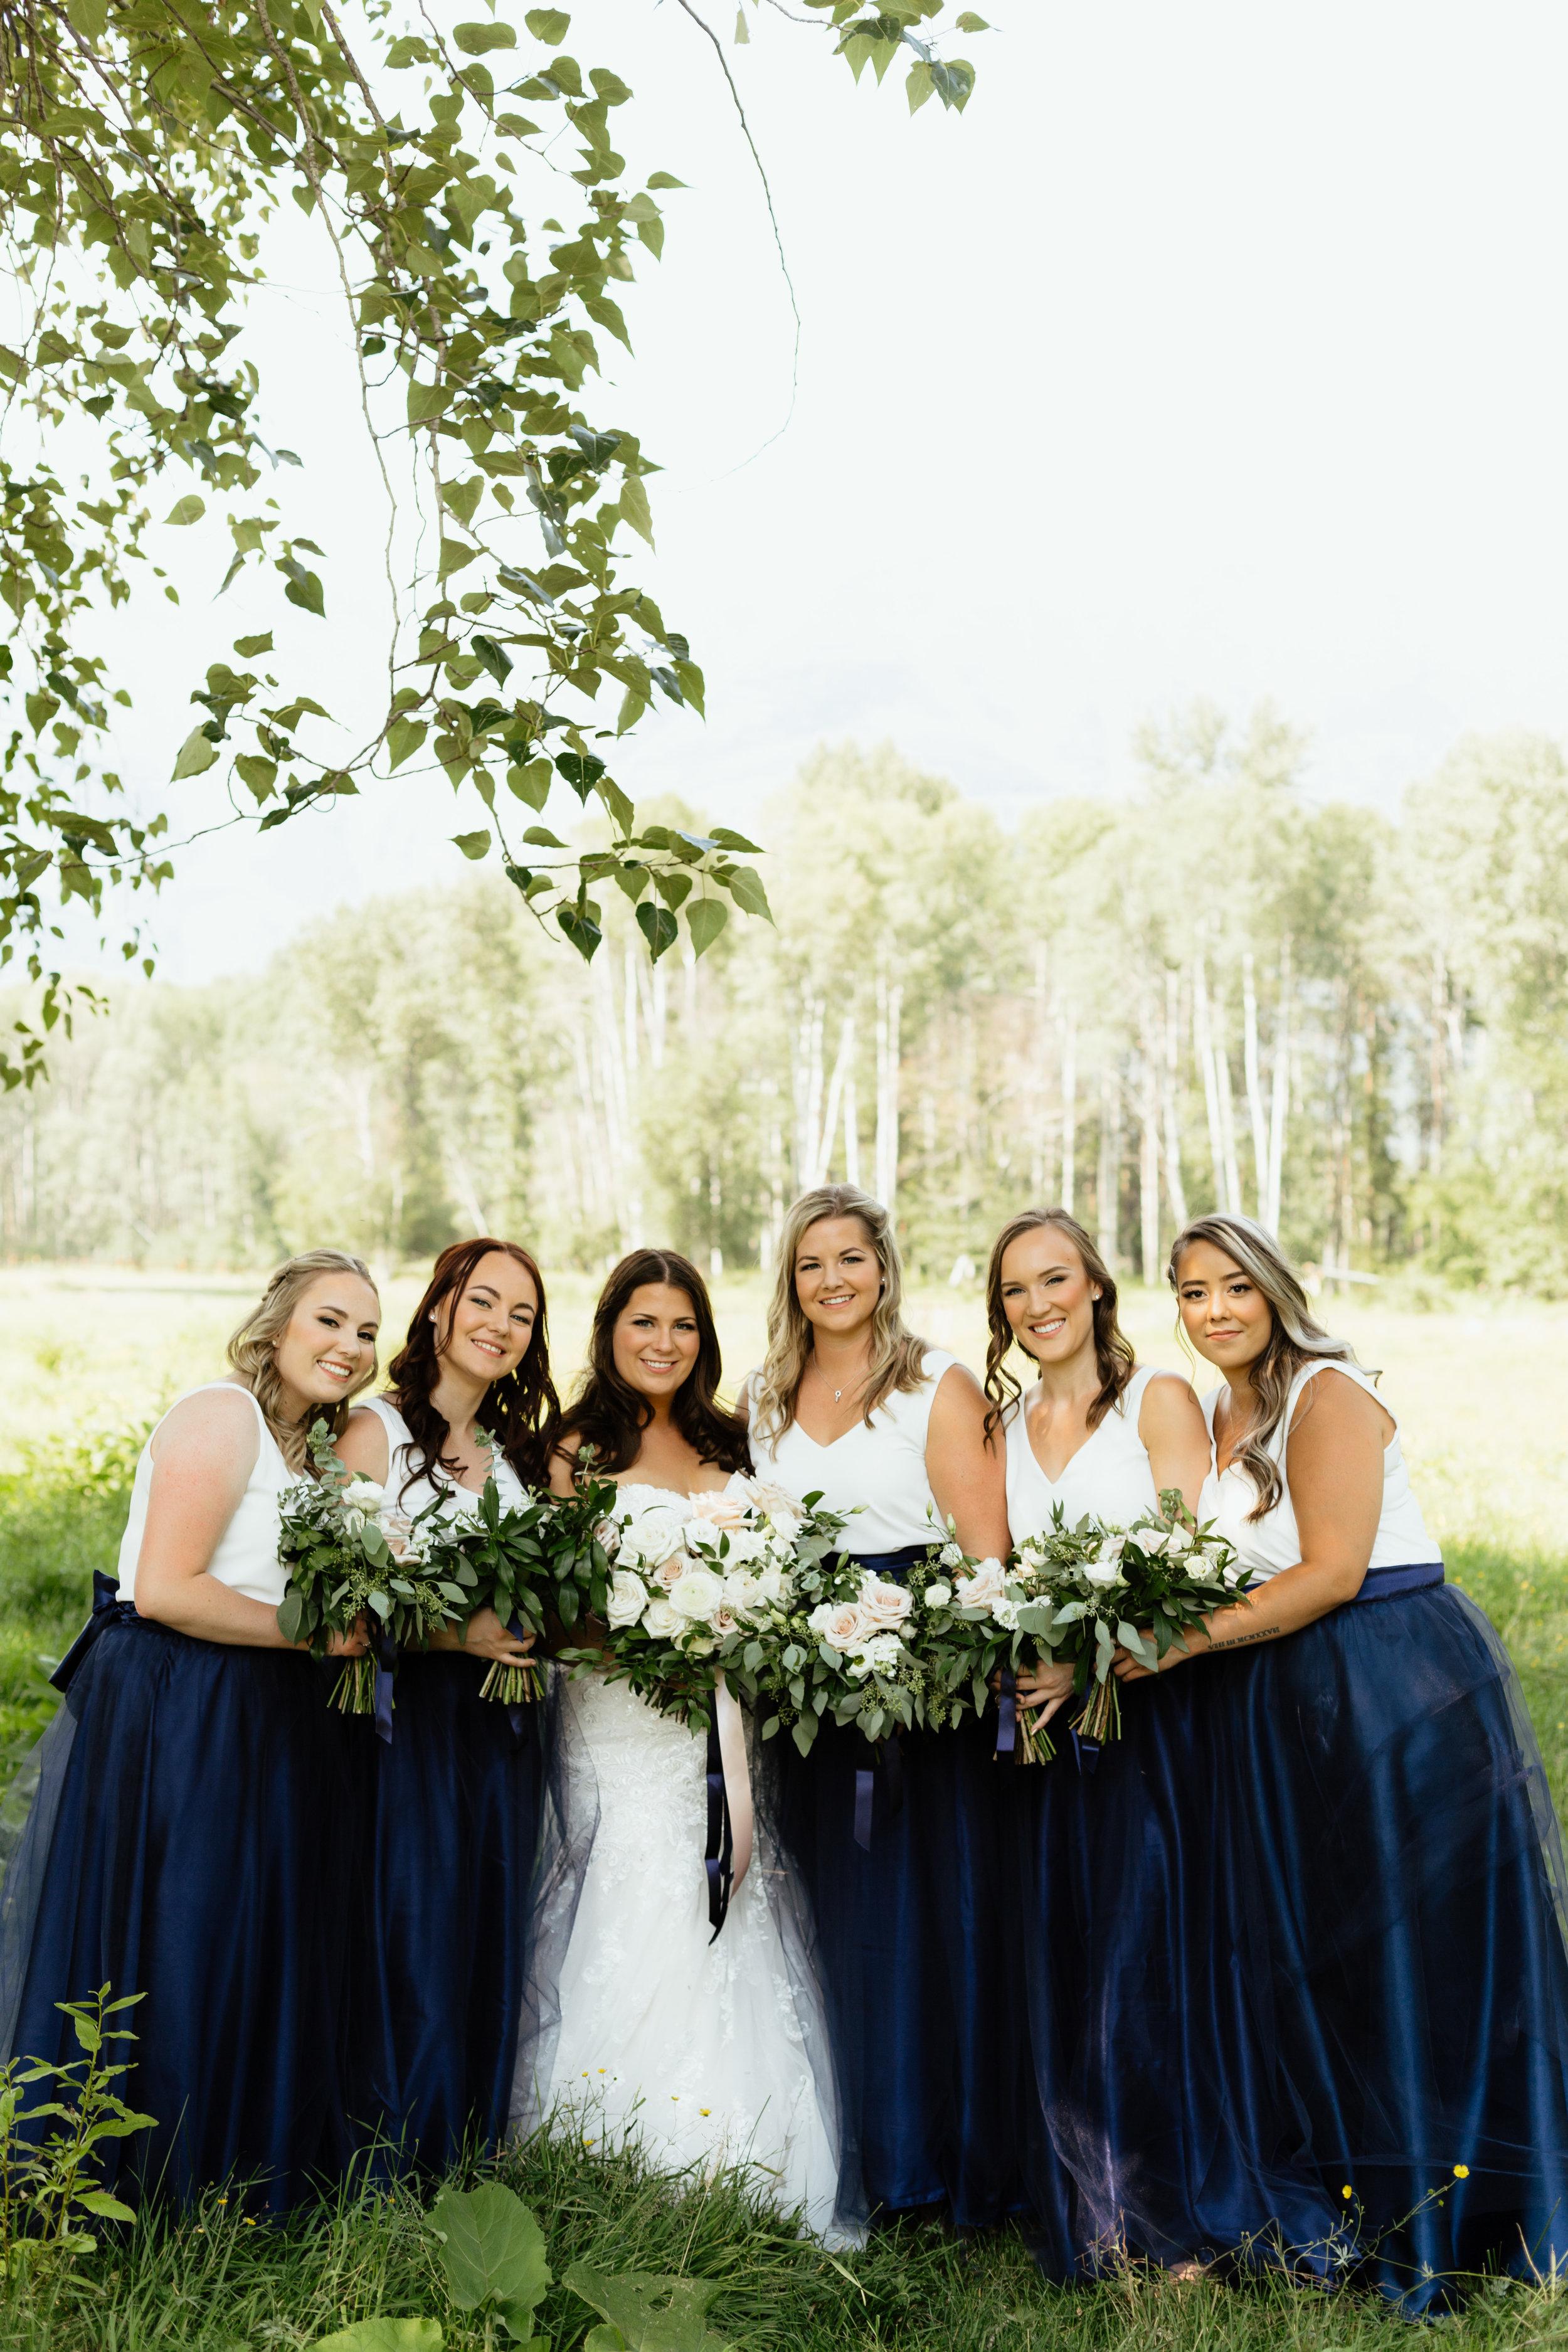 Trevor + Krista 5 - Bridal Portraits-71.jpg